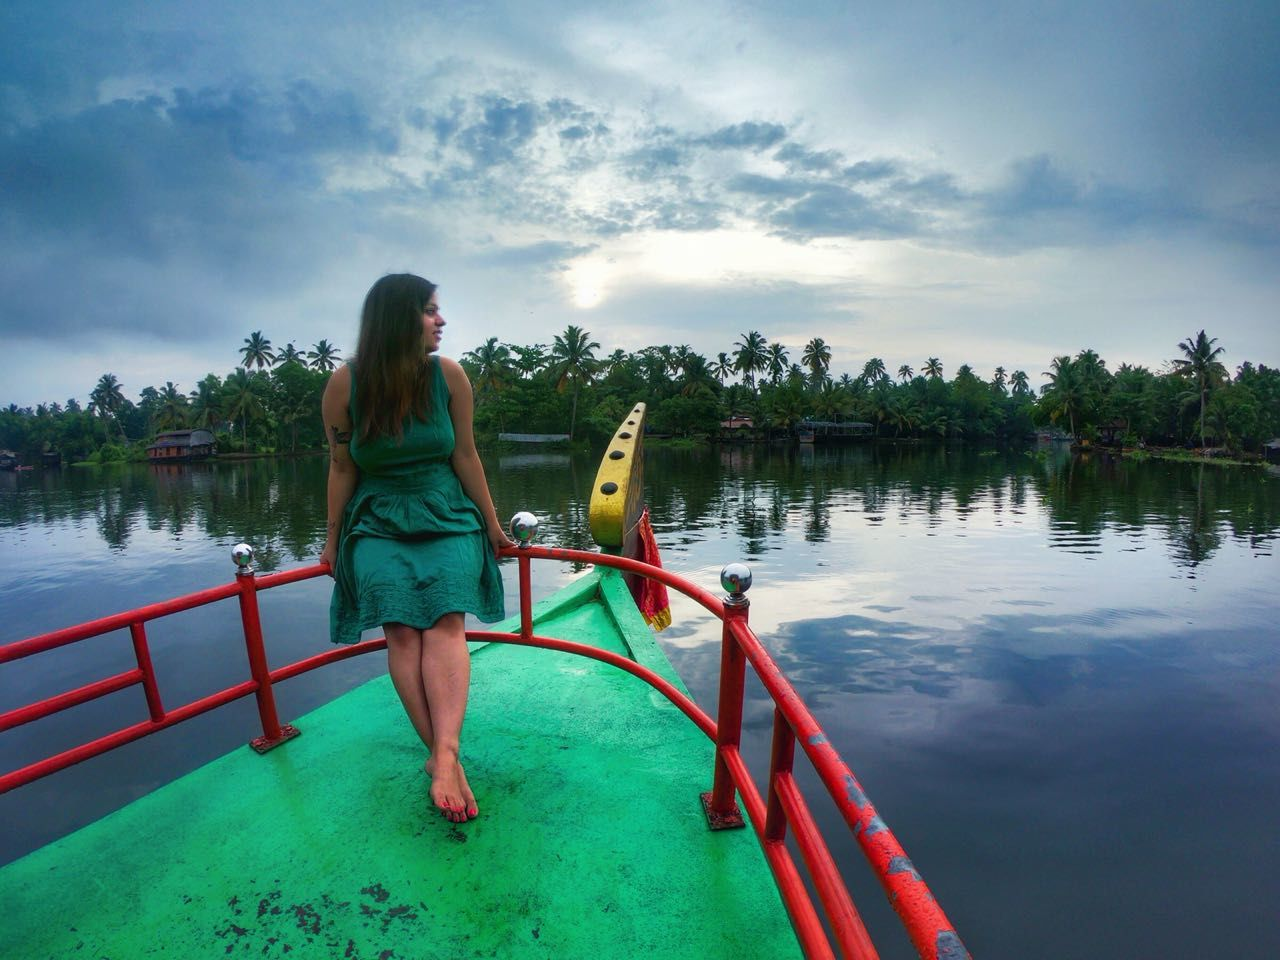 Photo of Kerala Backwaters By mittali